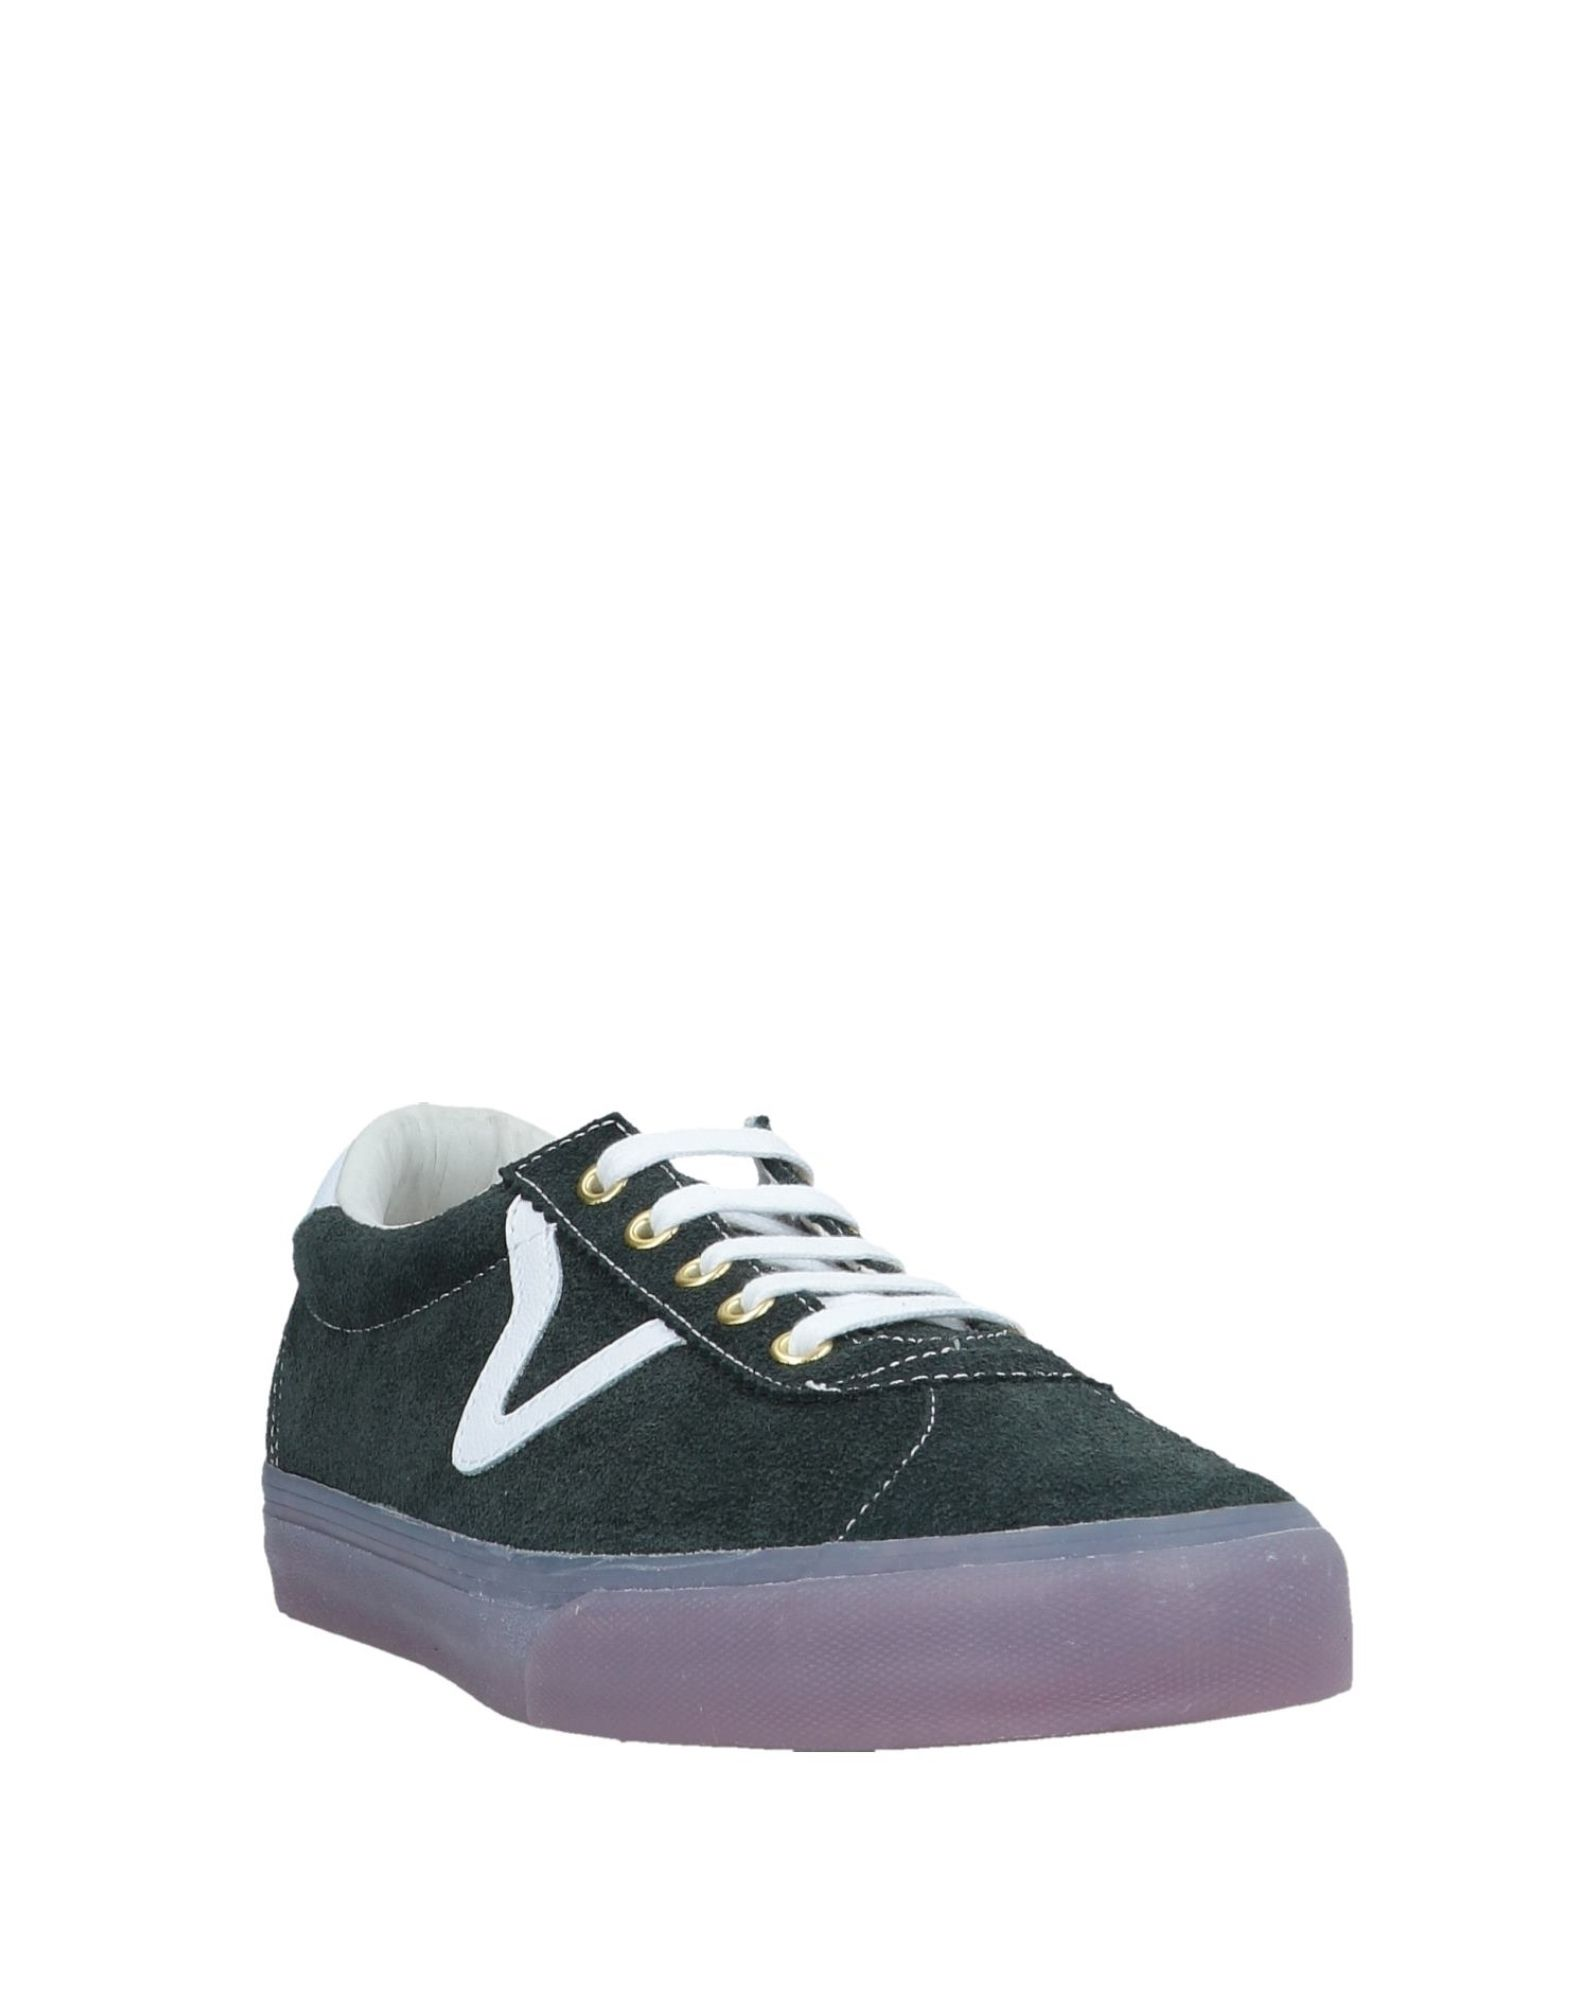 Vans Sneakers - Men Vans Sneakers online on  Australia Australia Australia - 11574173SS ec1b74